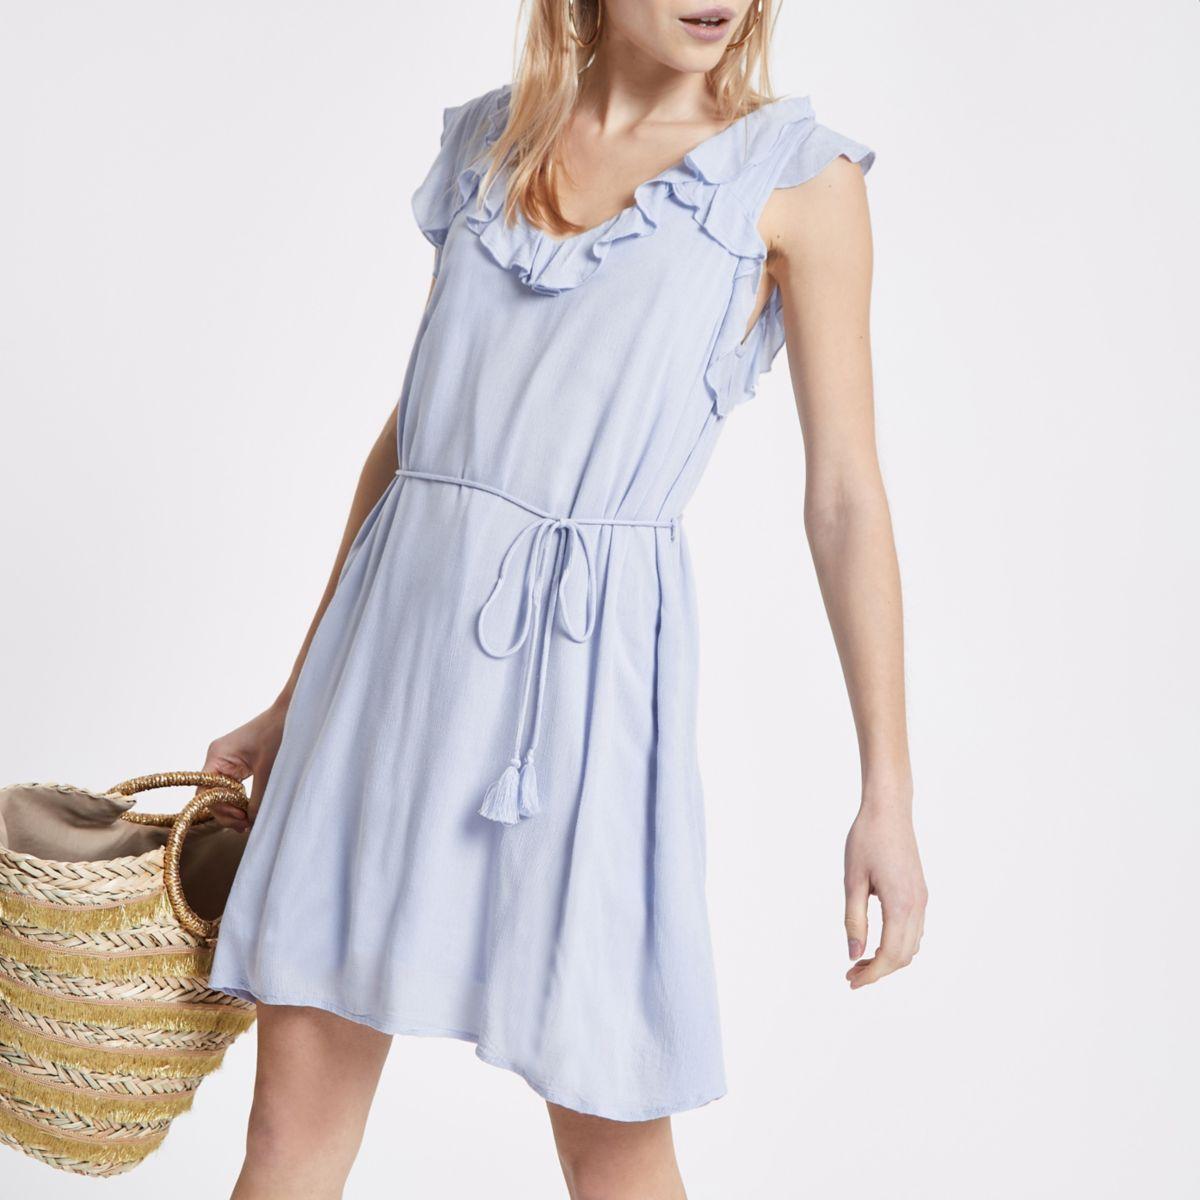 Light blue lace-up frill mini swing dress